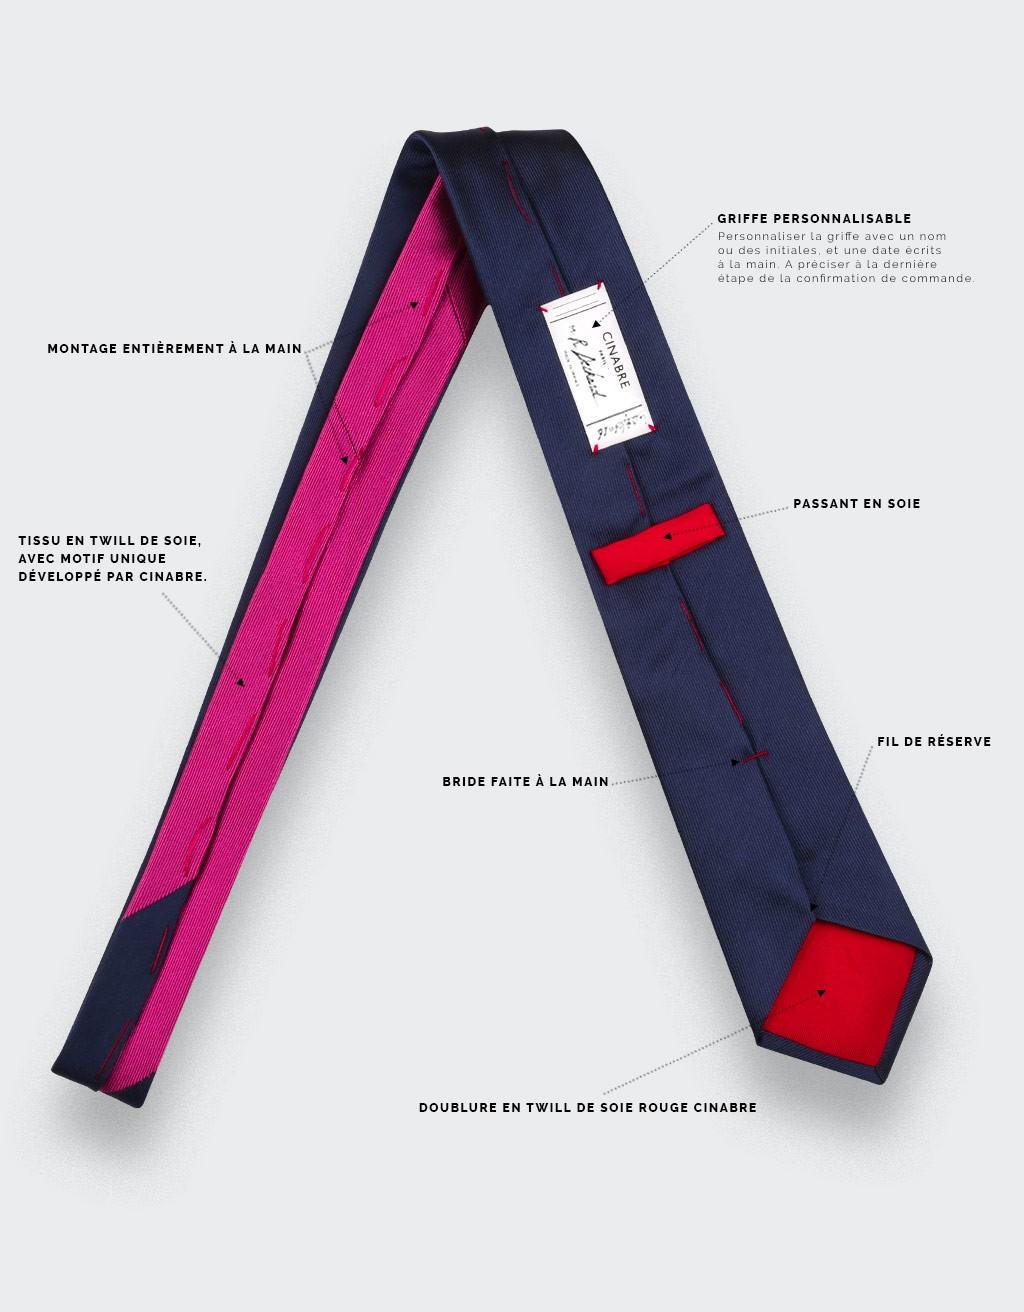 Cravate golf John Daly - soie- Cinabre Paris